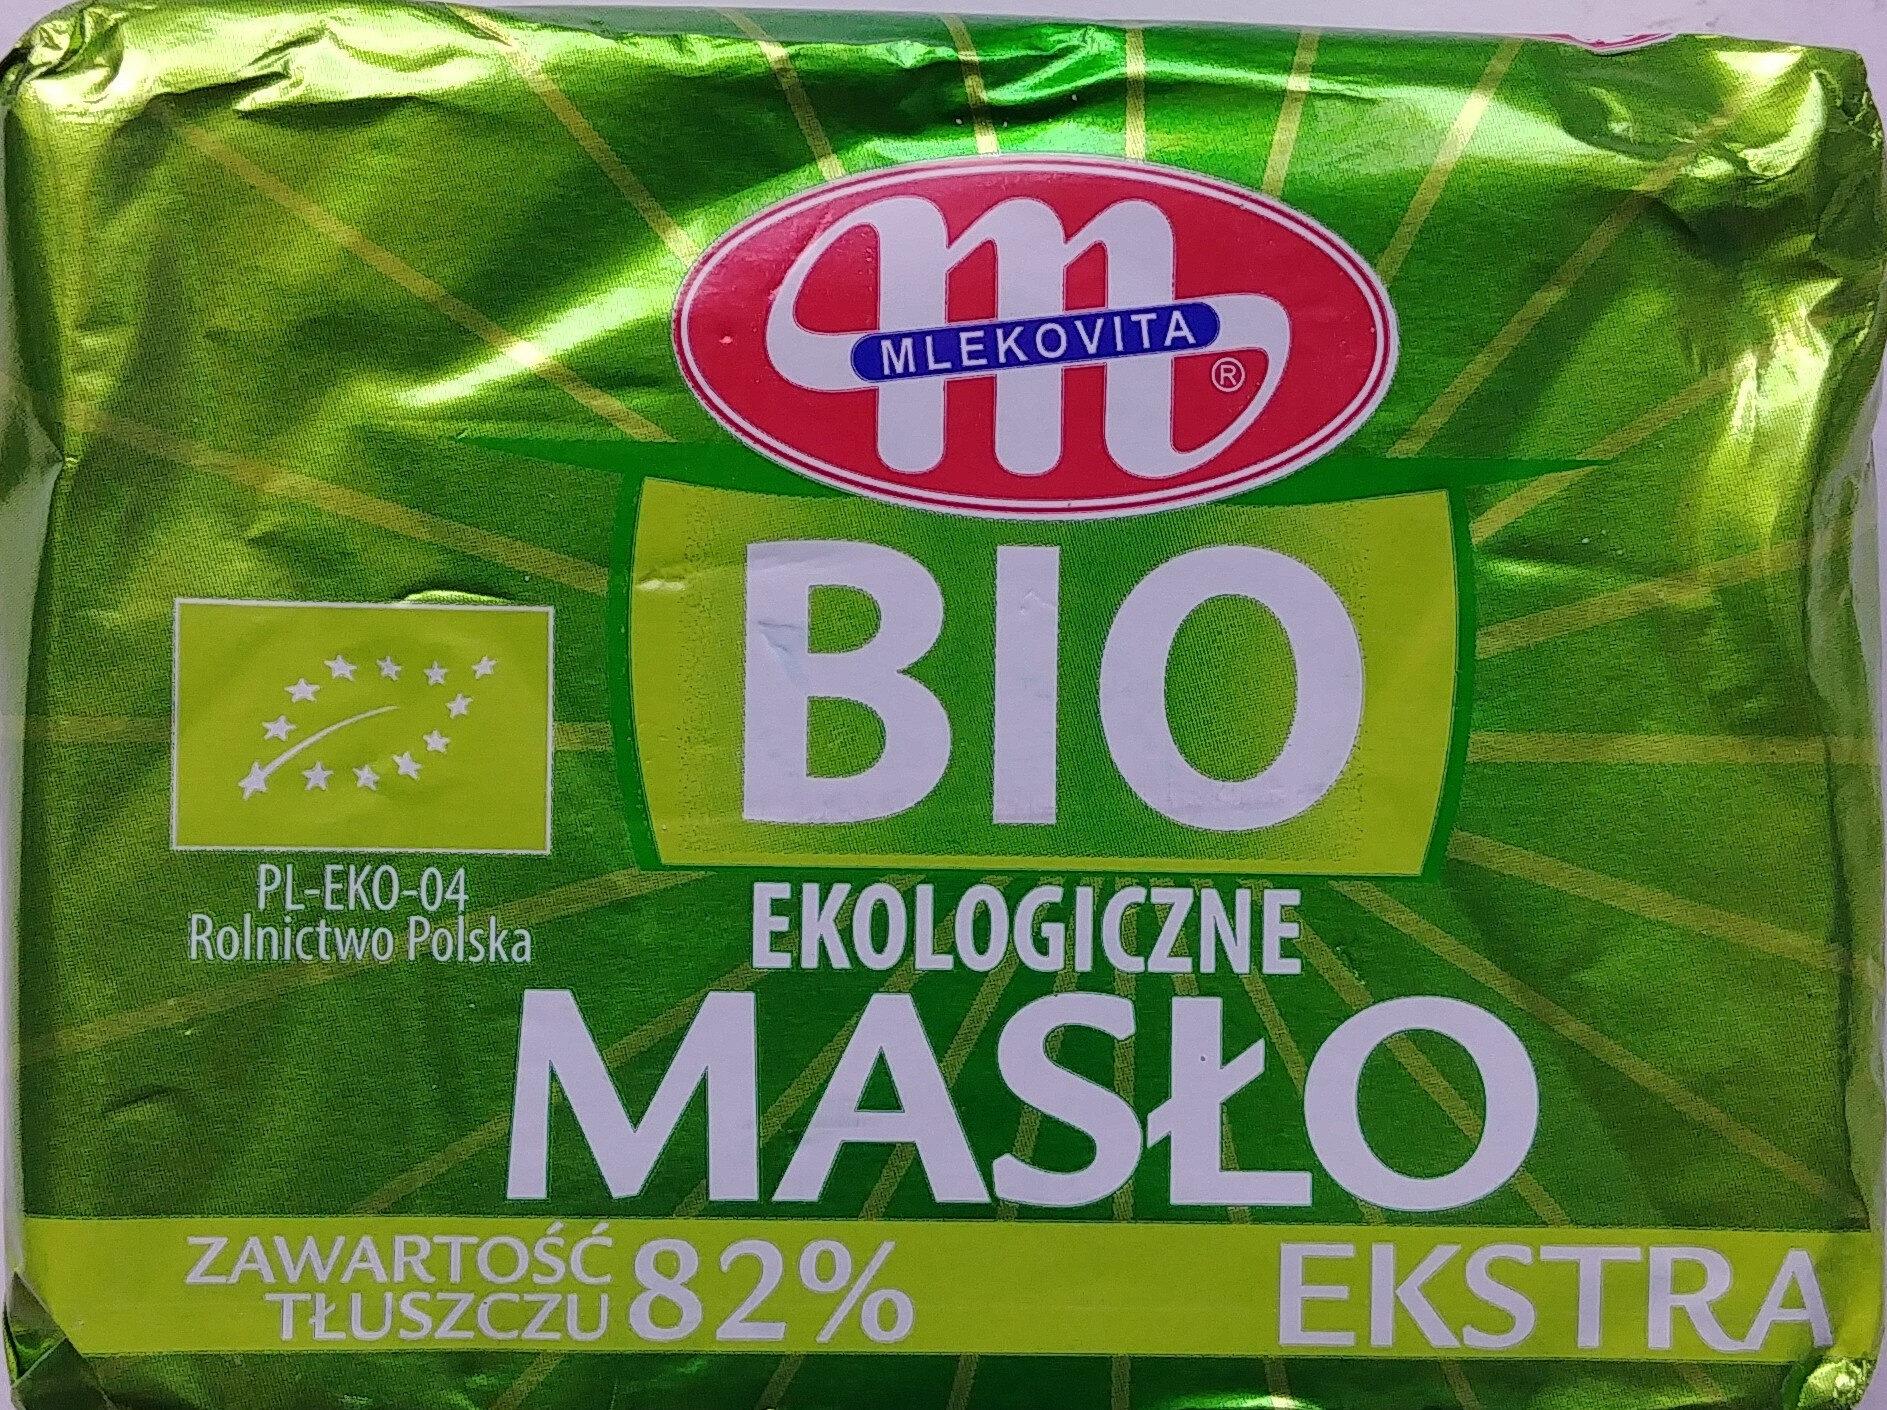 Masło ekstraekologiczne BIO - Produkt - pl